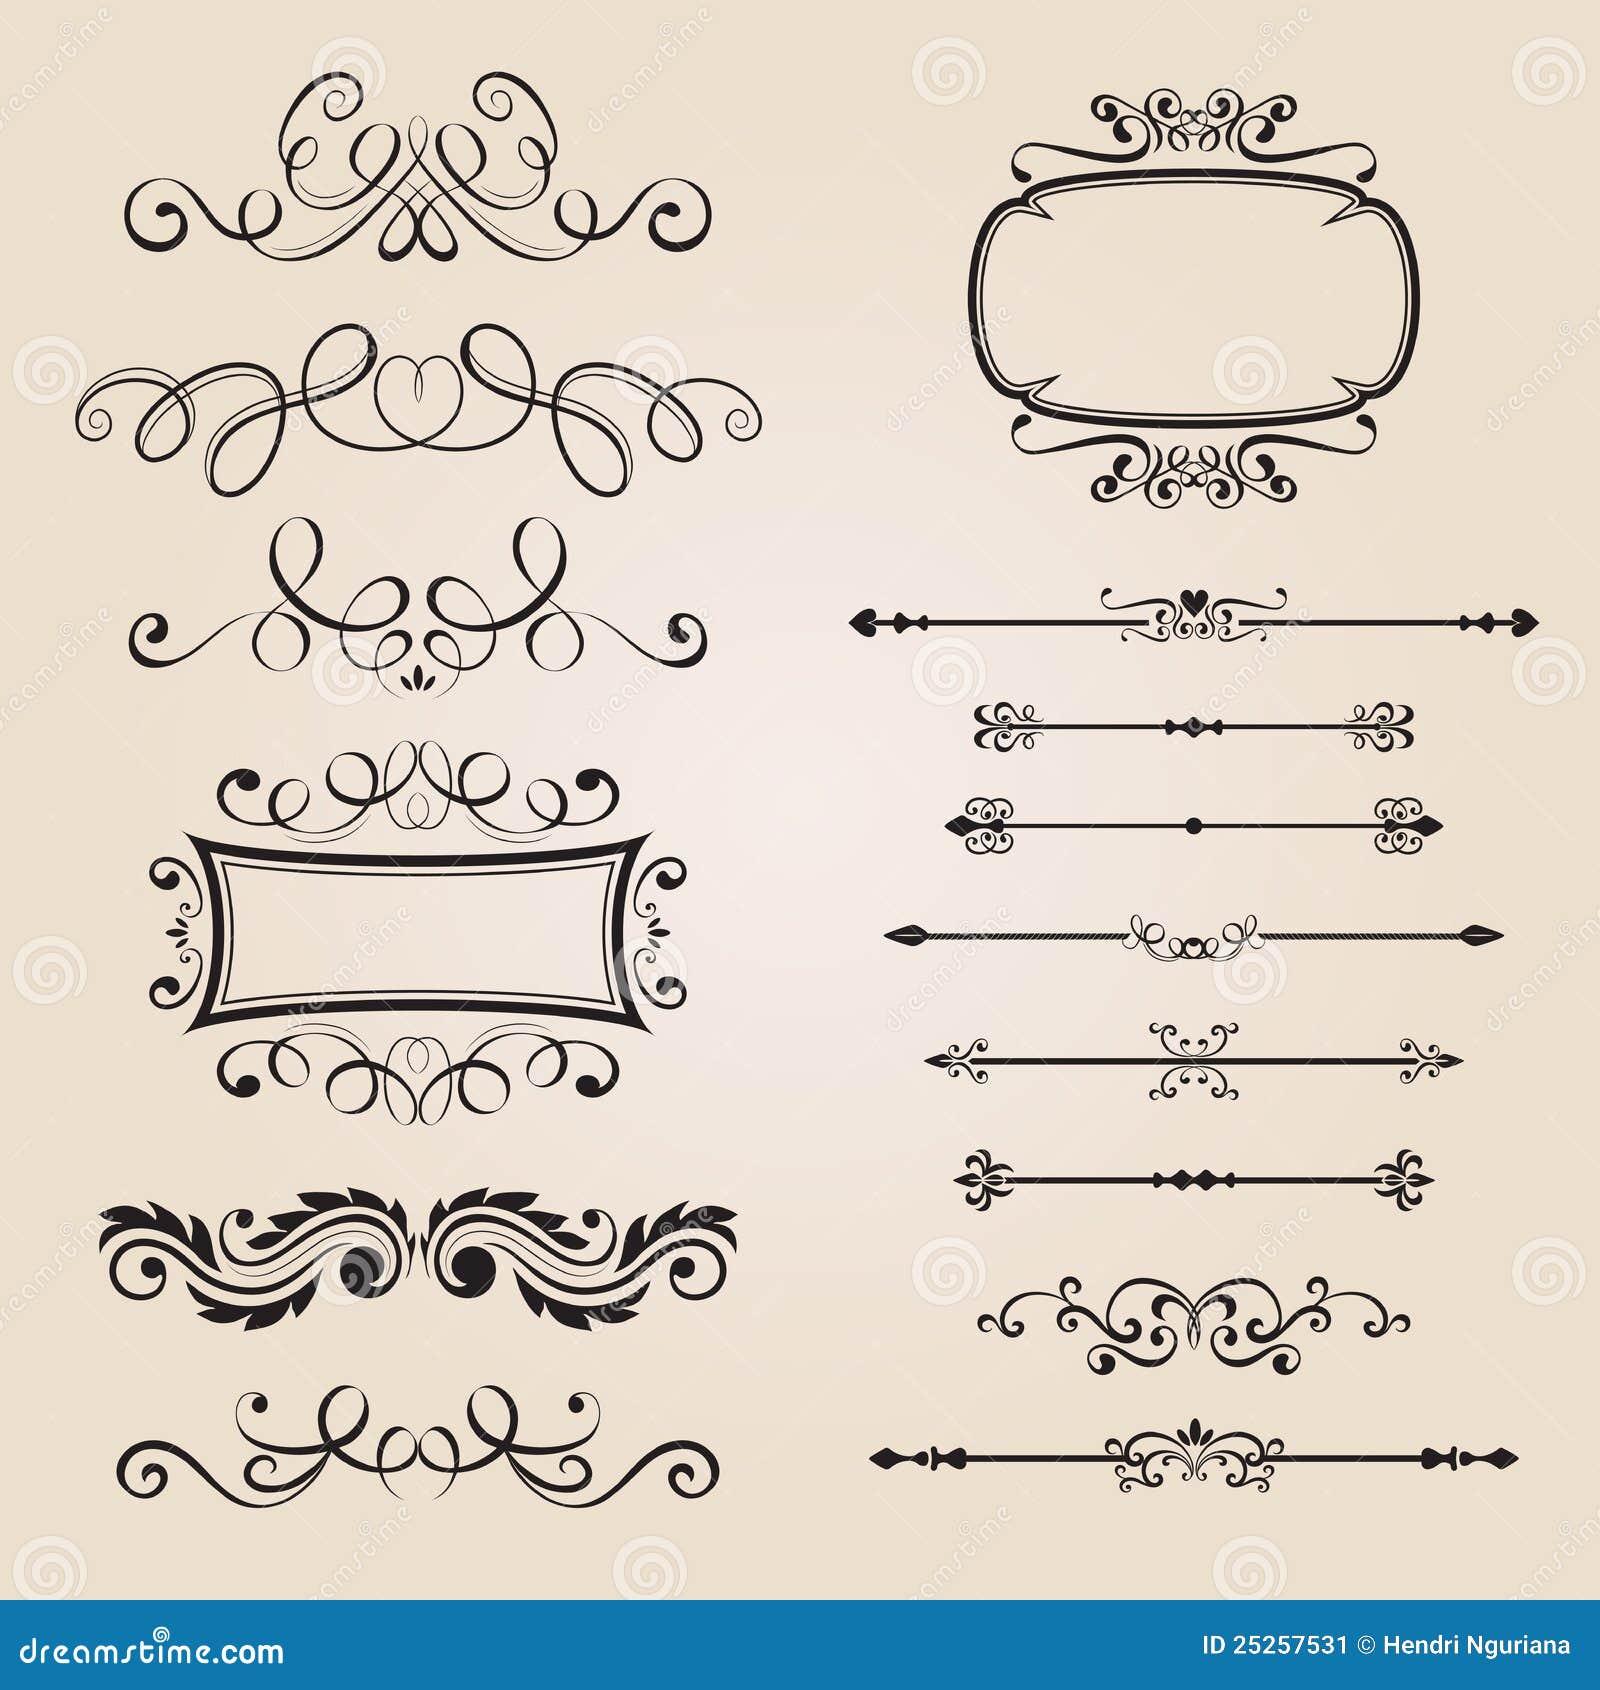 Classic Border Ornament Stock Image - Image: 25257531